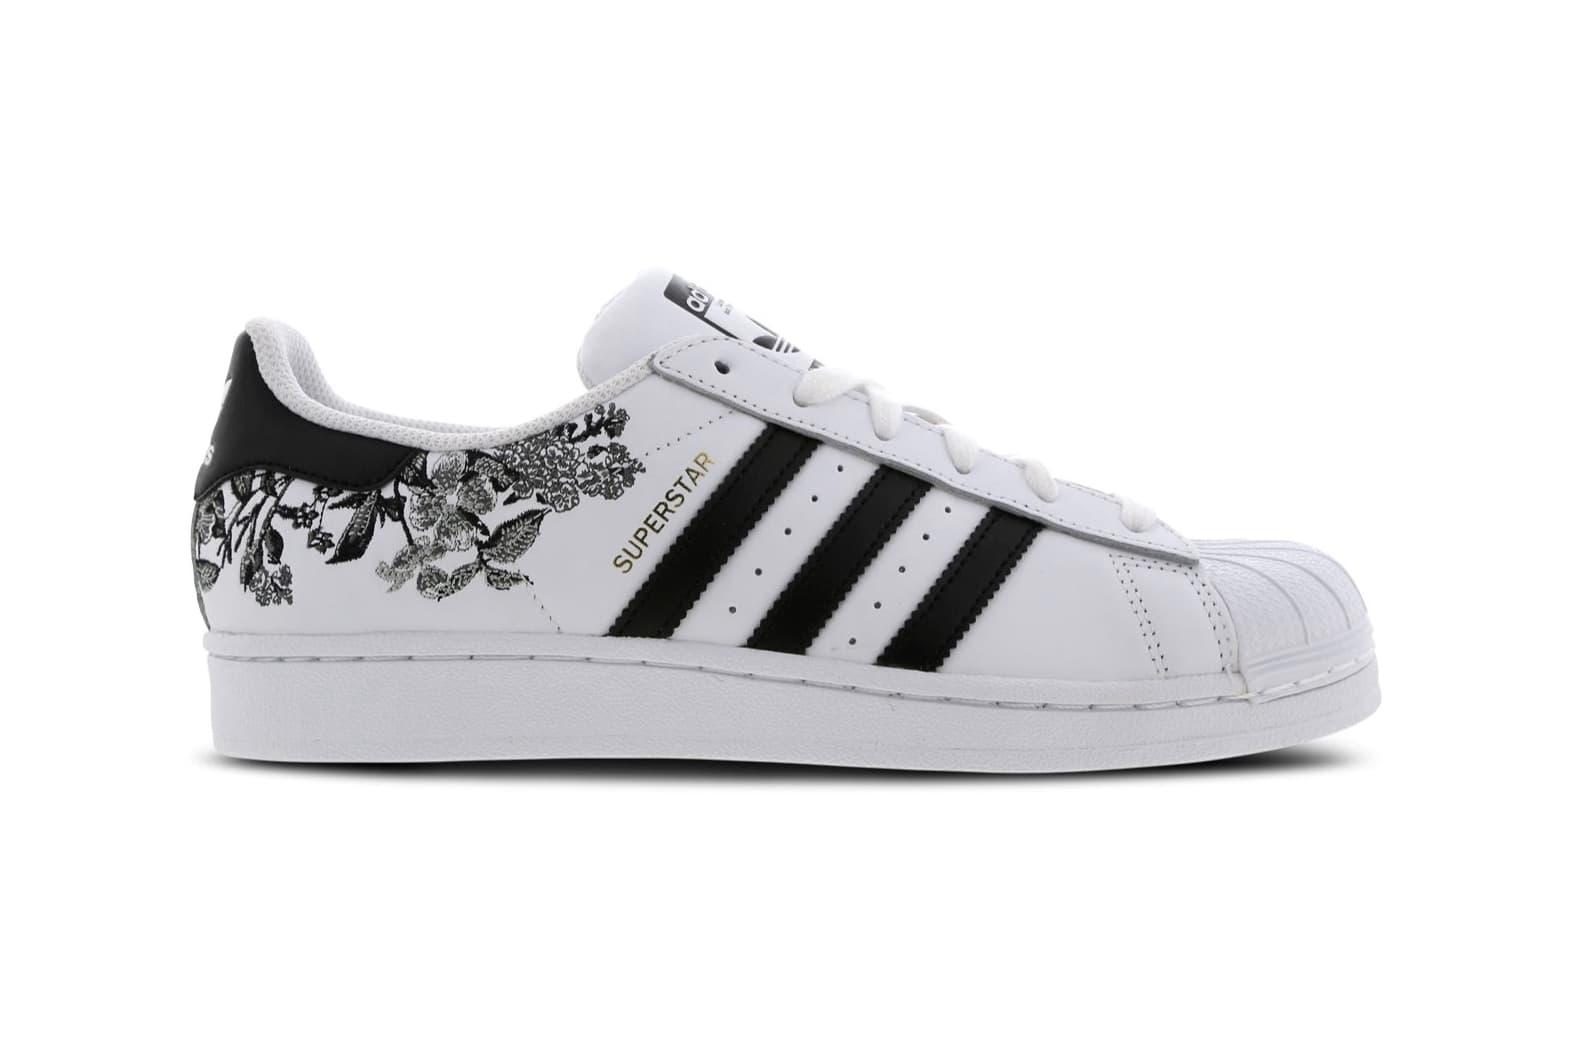 Adidas Originals Floral Superstar 80s Sneakers Hypebae